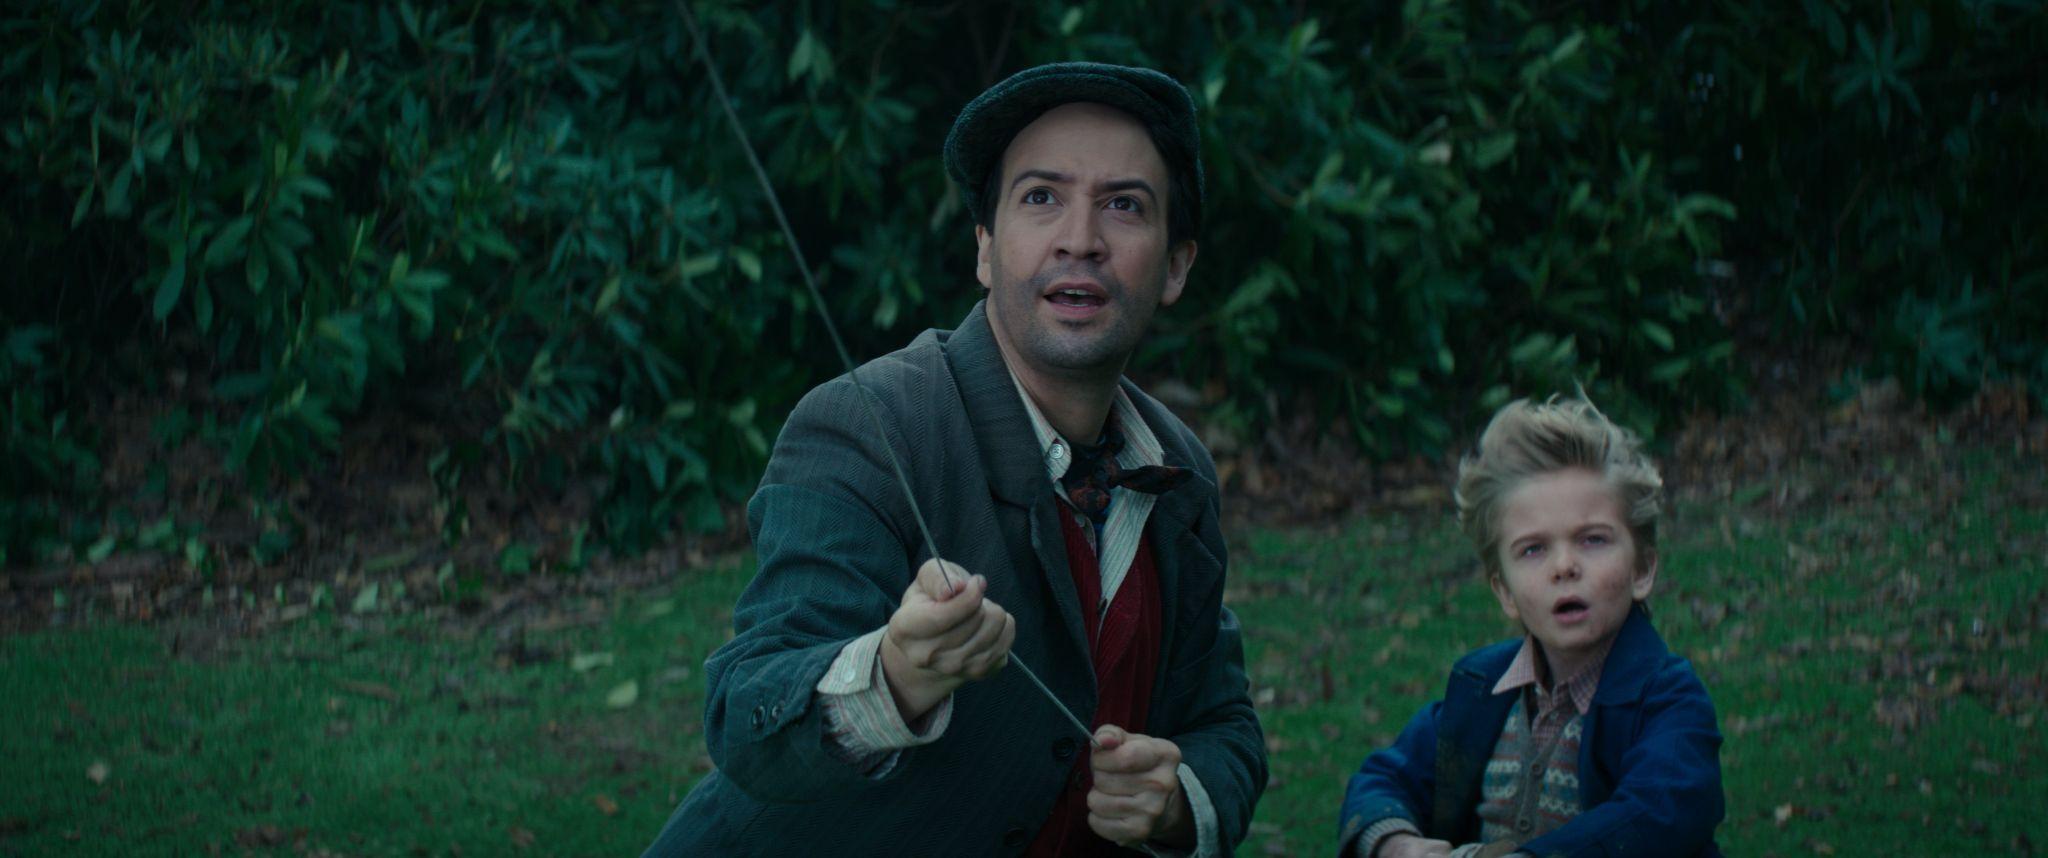 Mary Poppins Returns Lin Manuel Miranda On Why The Original Makes